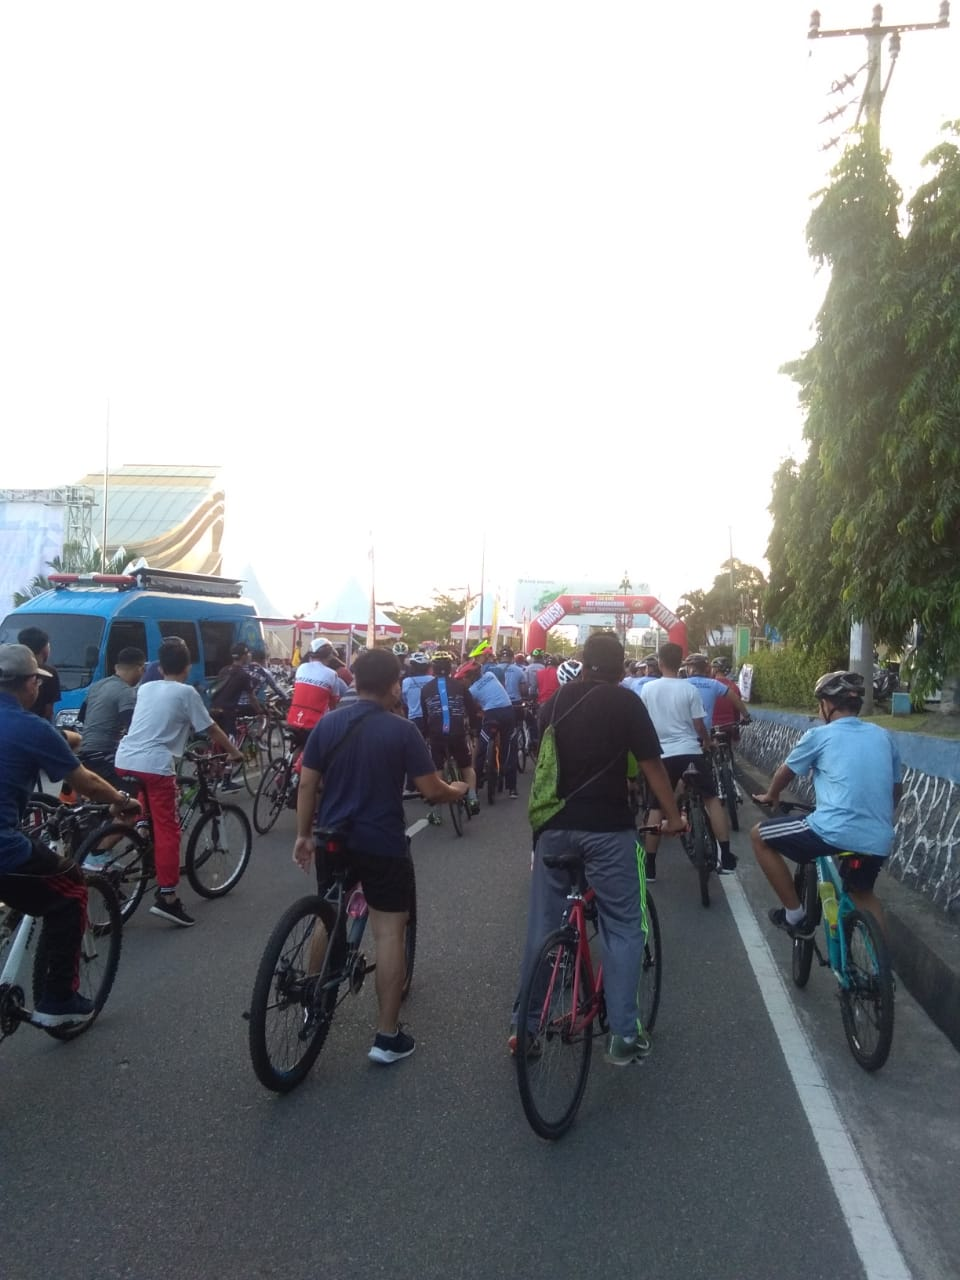 Kapolres : Terimakasih Masyarakat Tanjungpinang